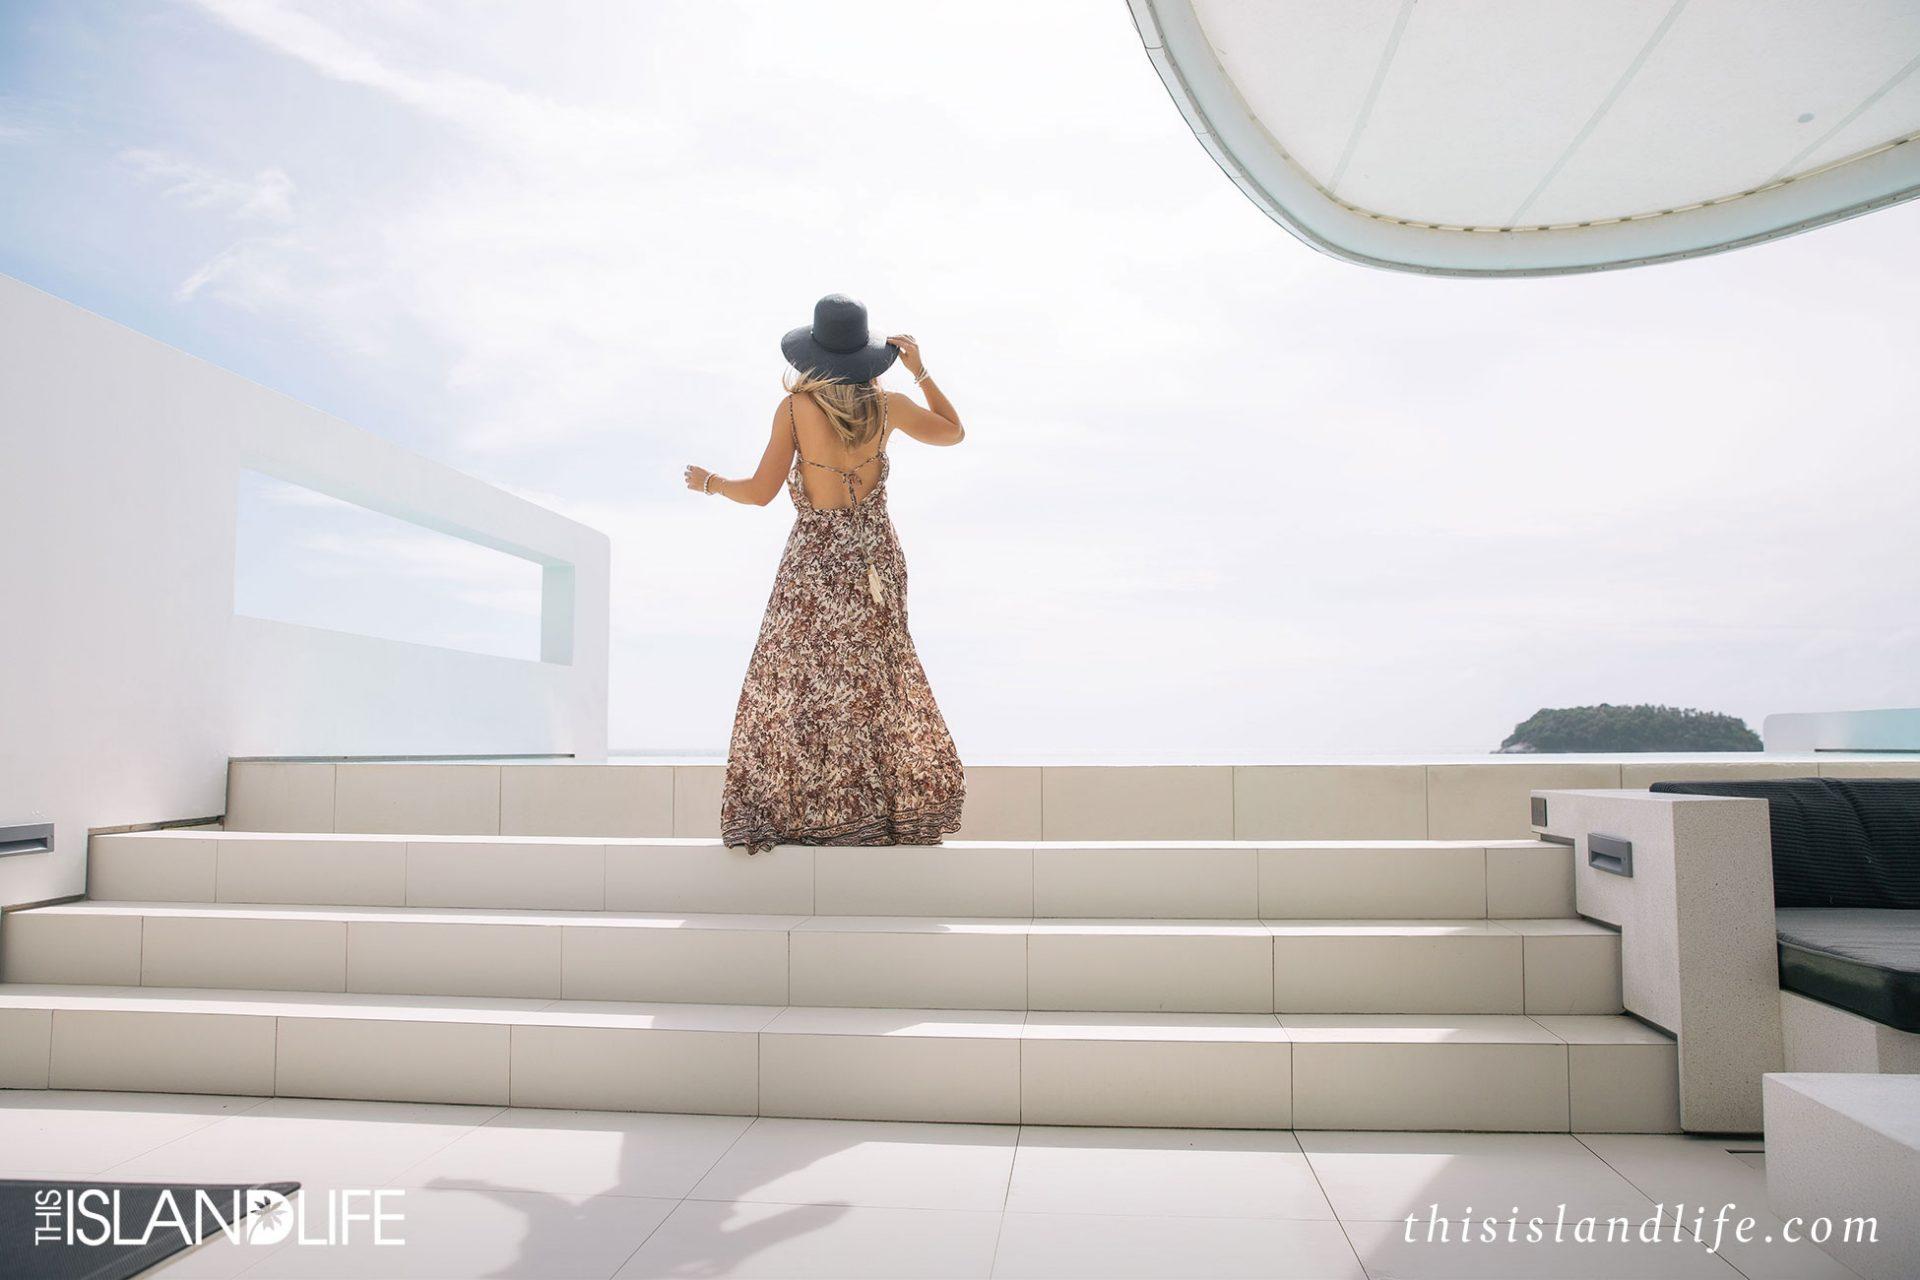 this-island-life-_-helen-kaminski-_-phuket-thailand-_-24-wm